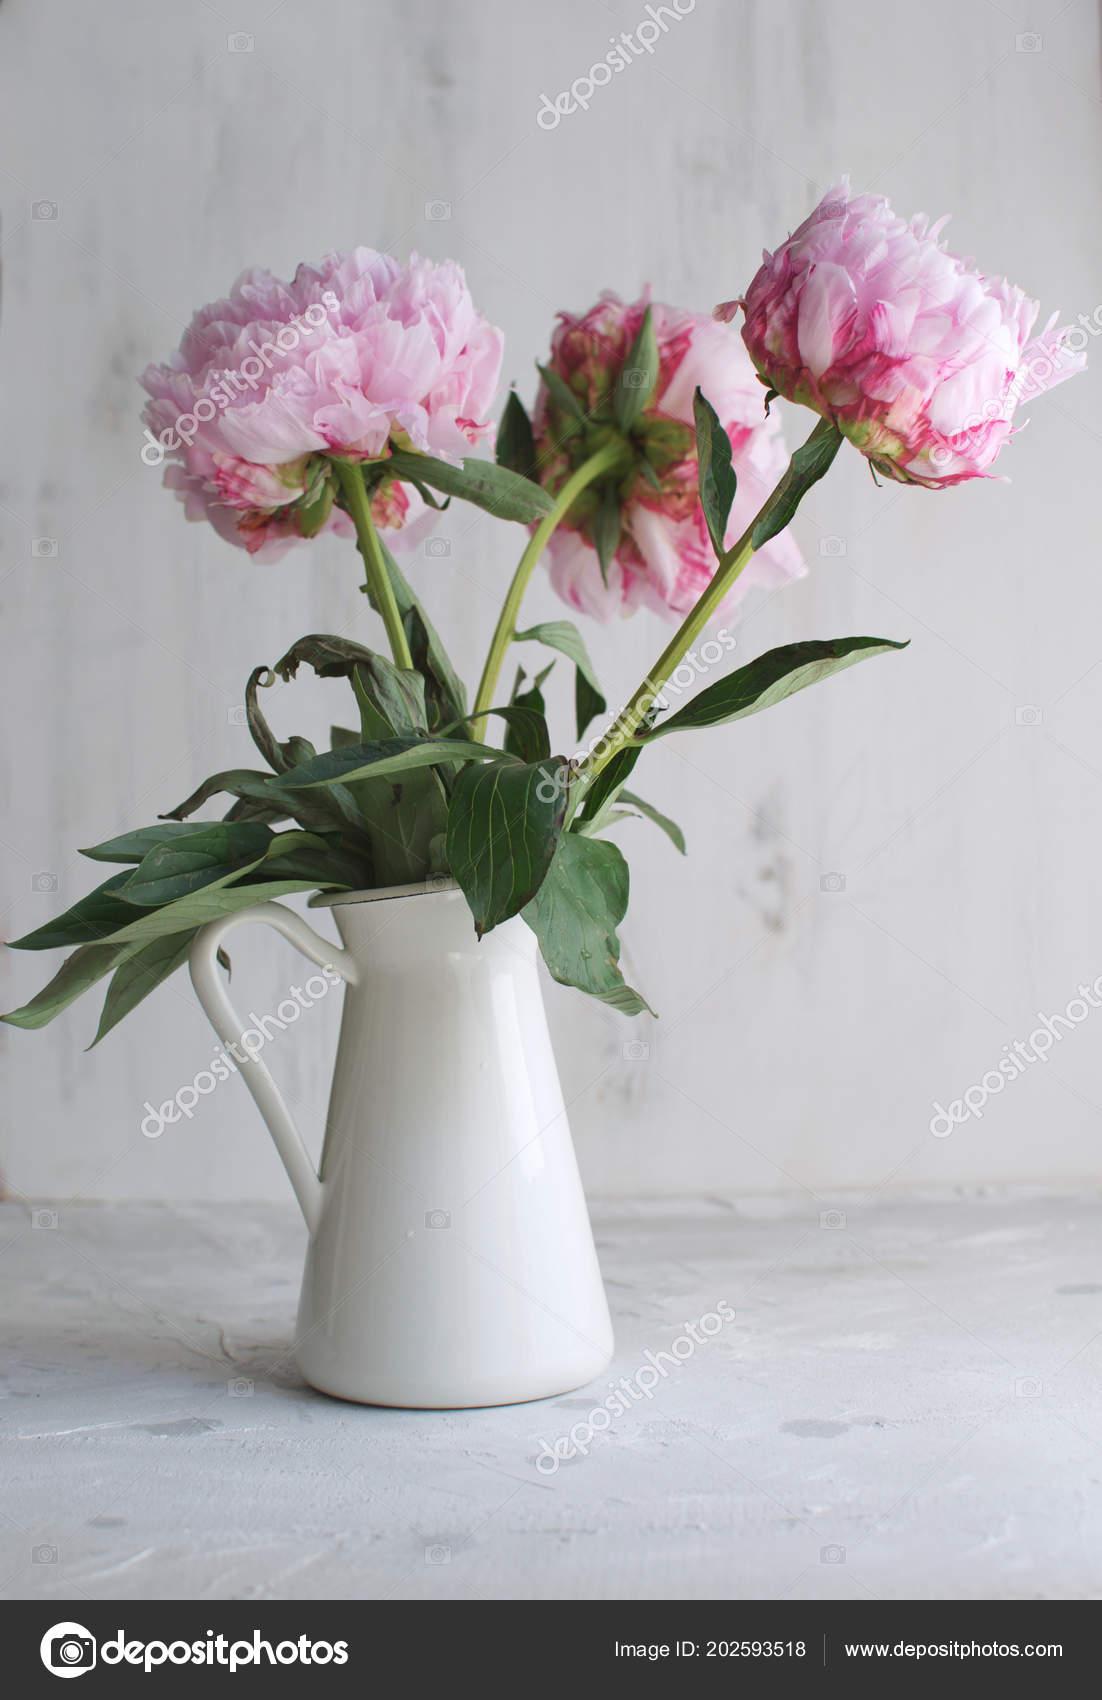 Peonies Flowers White White Vase Background Wedding Stock Photo